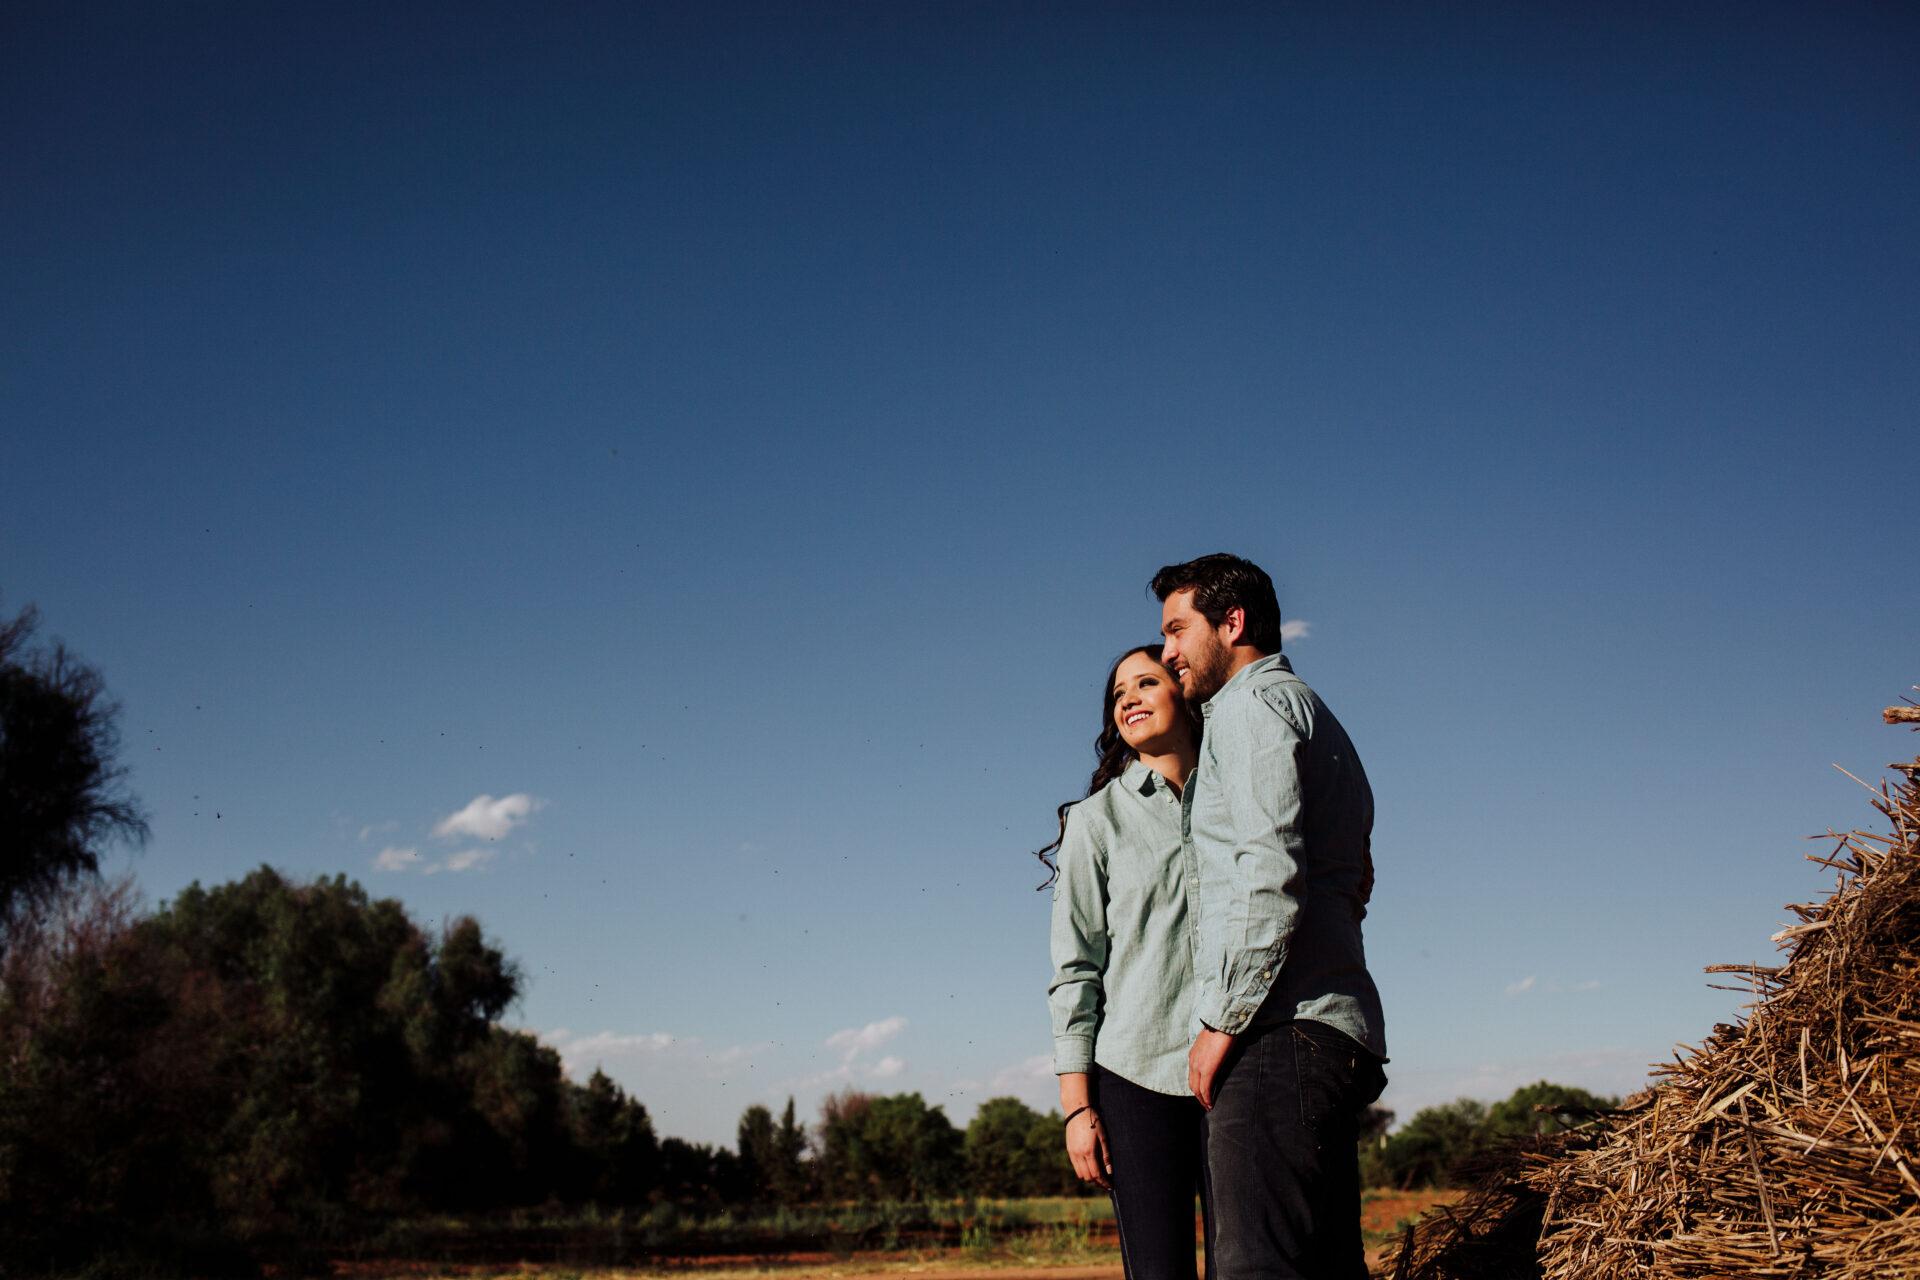 javier_noriega_fotografo_save_the_date_zacatecas_wedding_photographer7